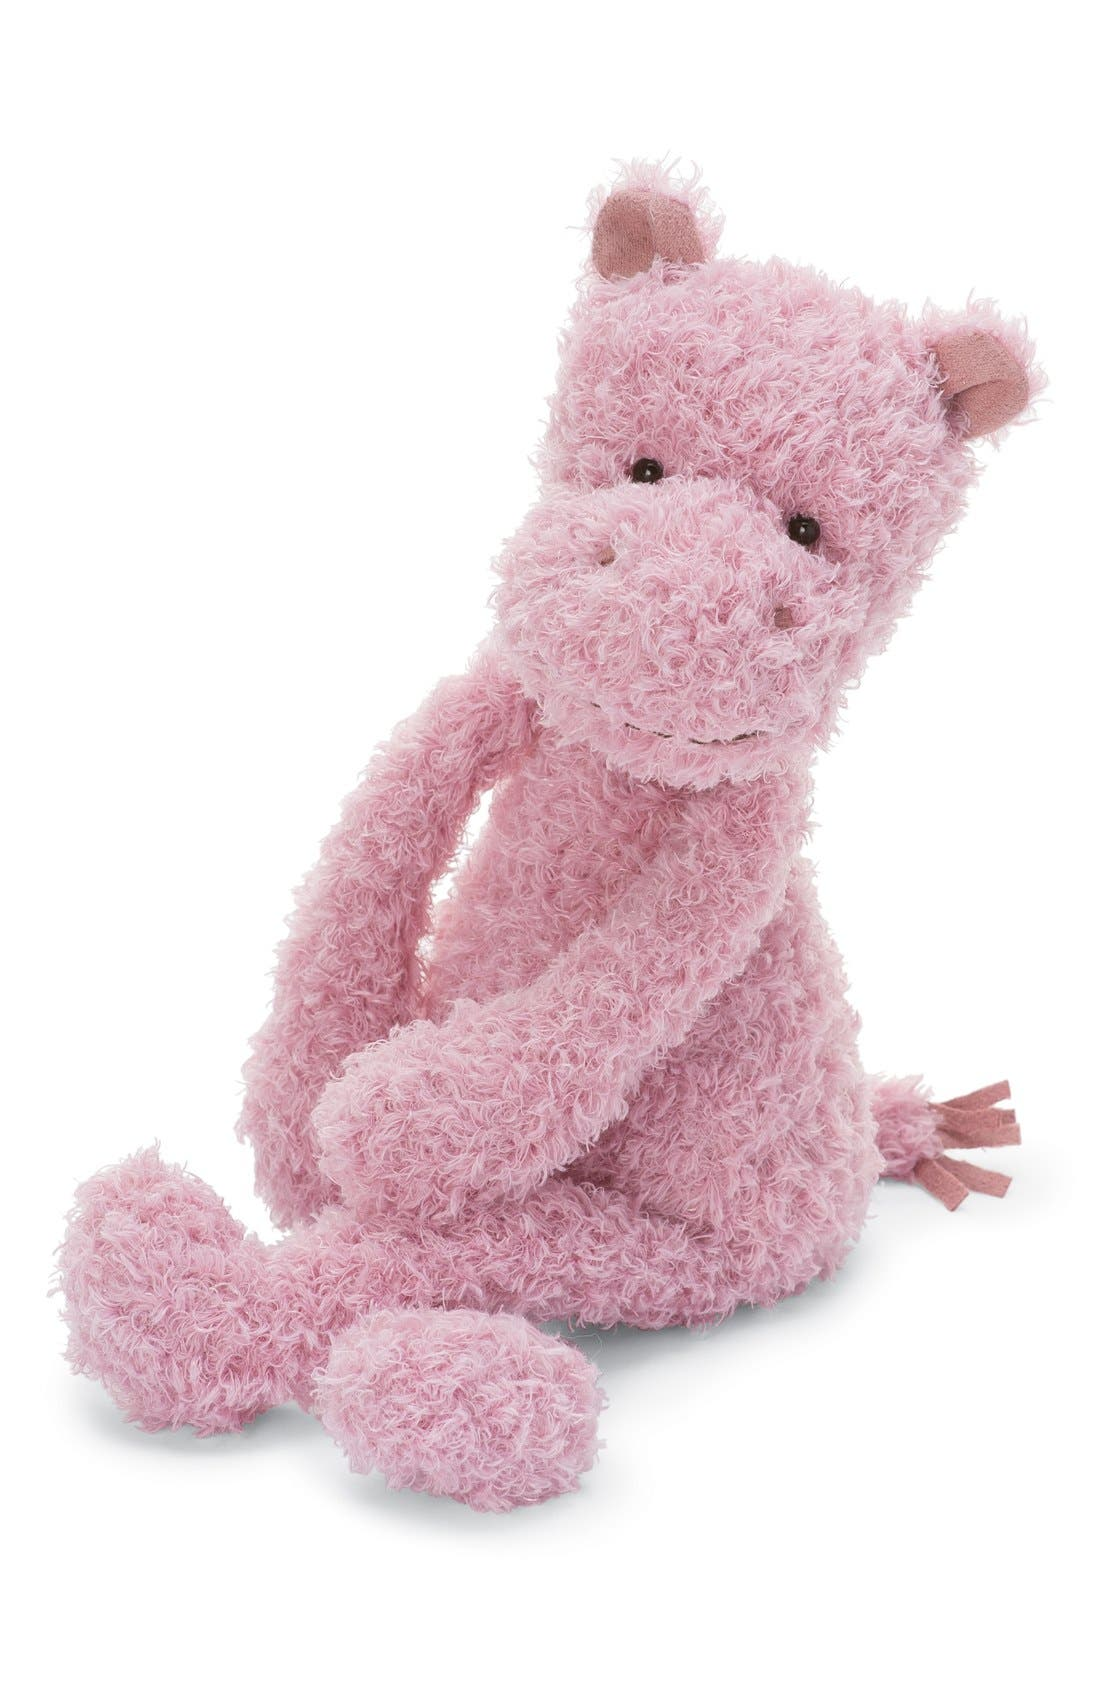 'Wild Thing Hippo' Stuffed Animal,                         Main,                         color,